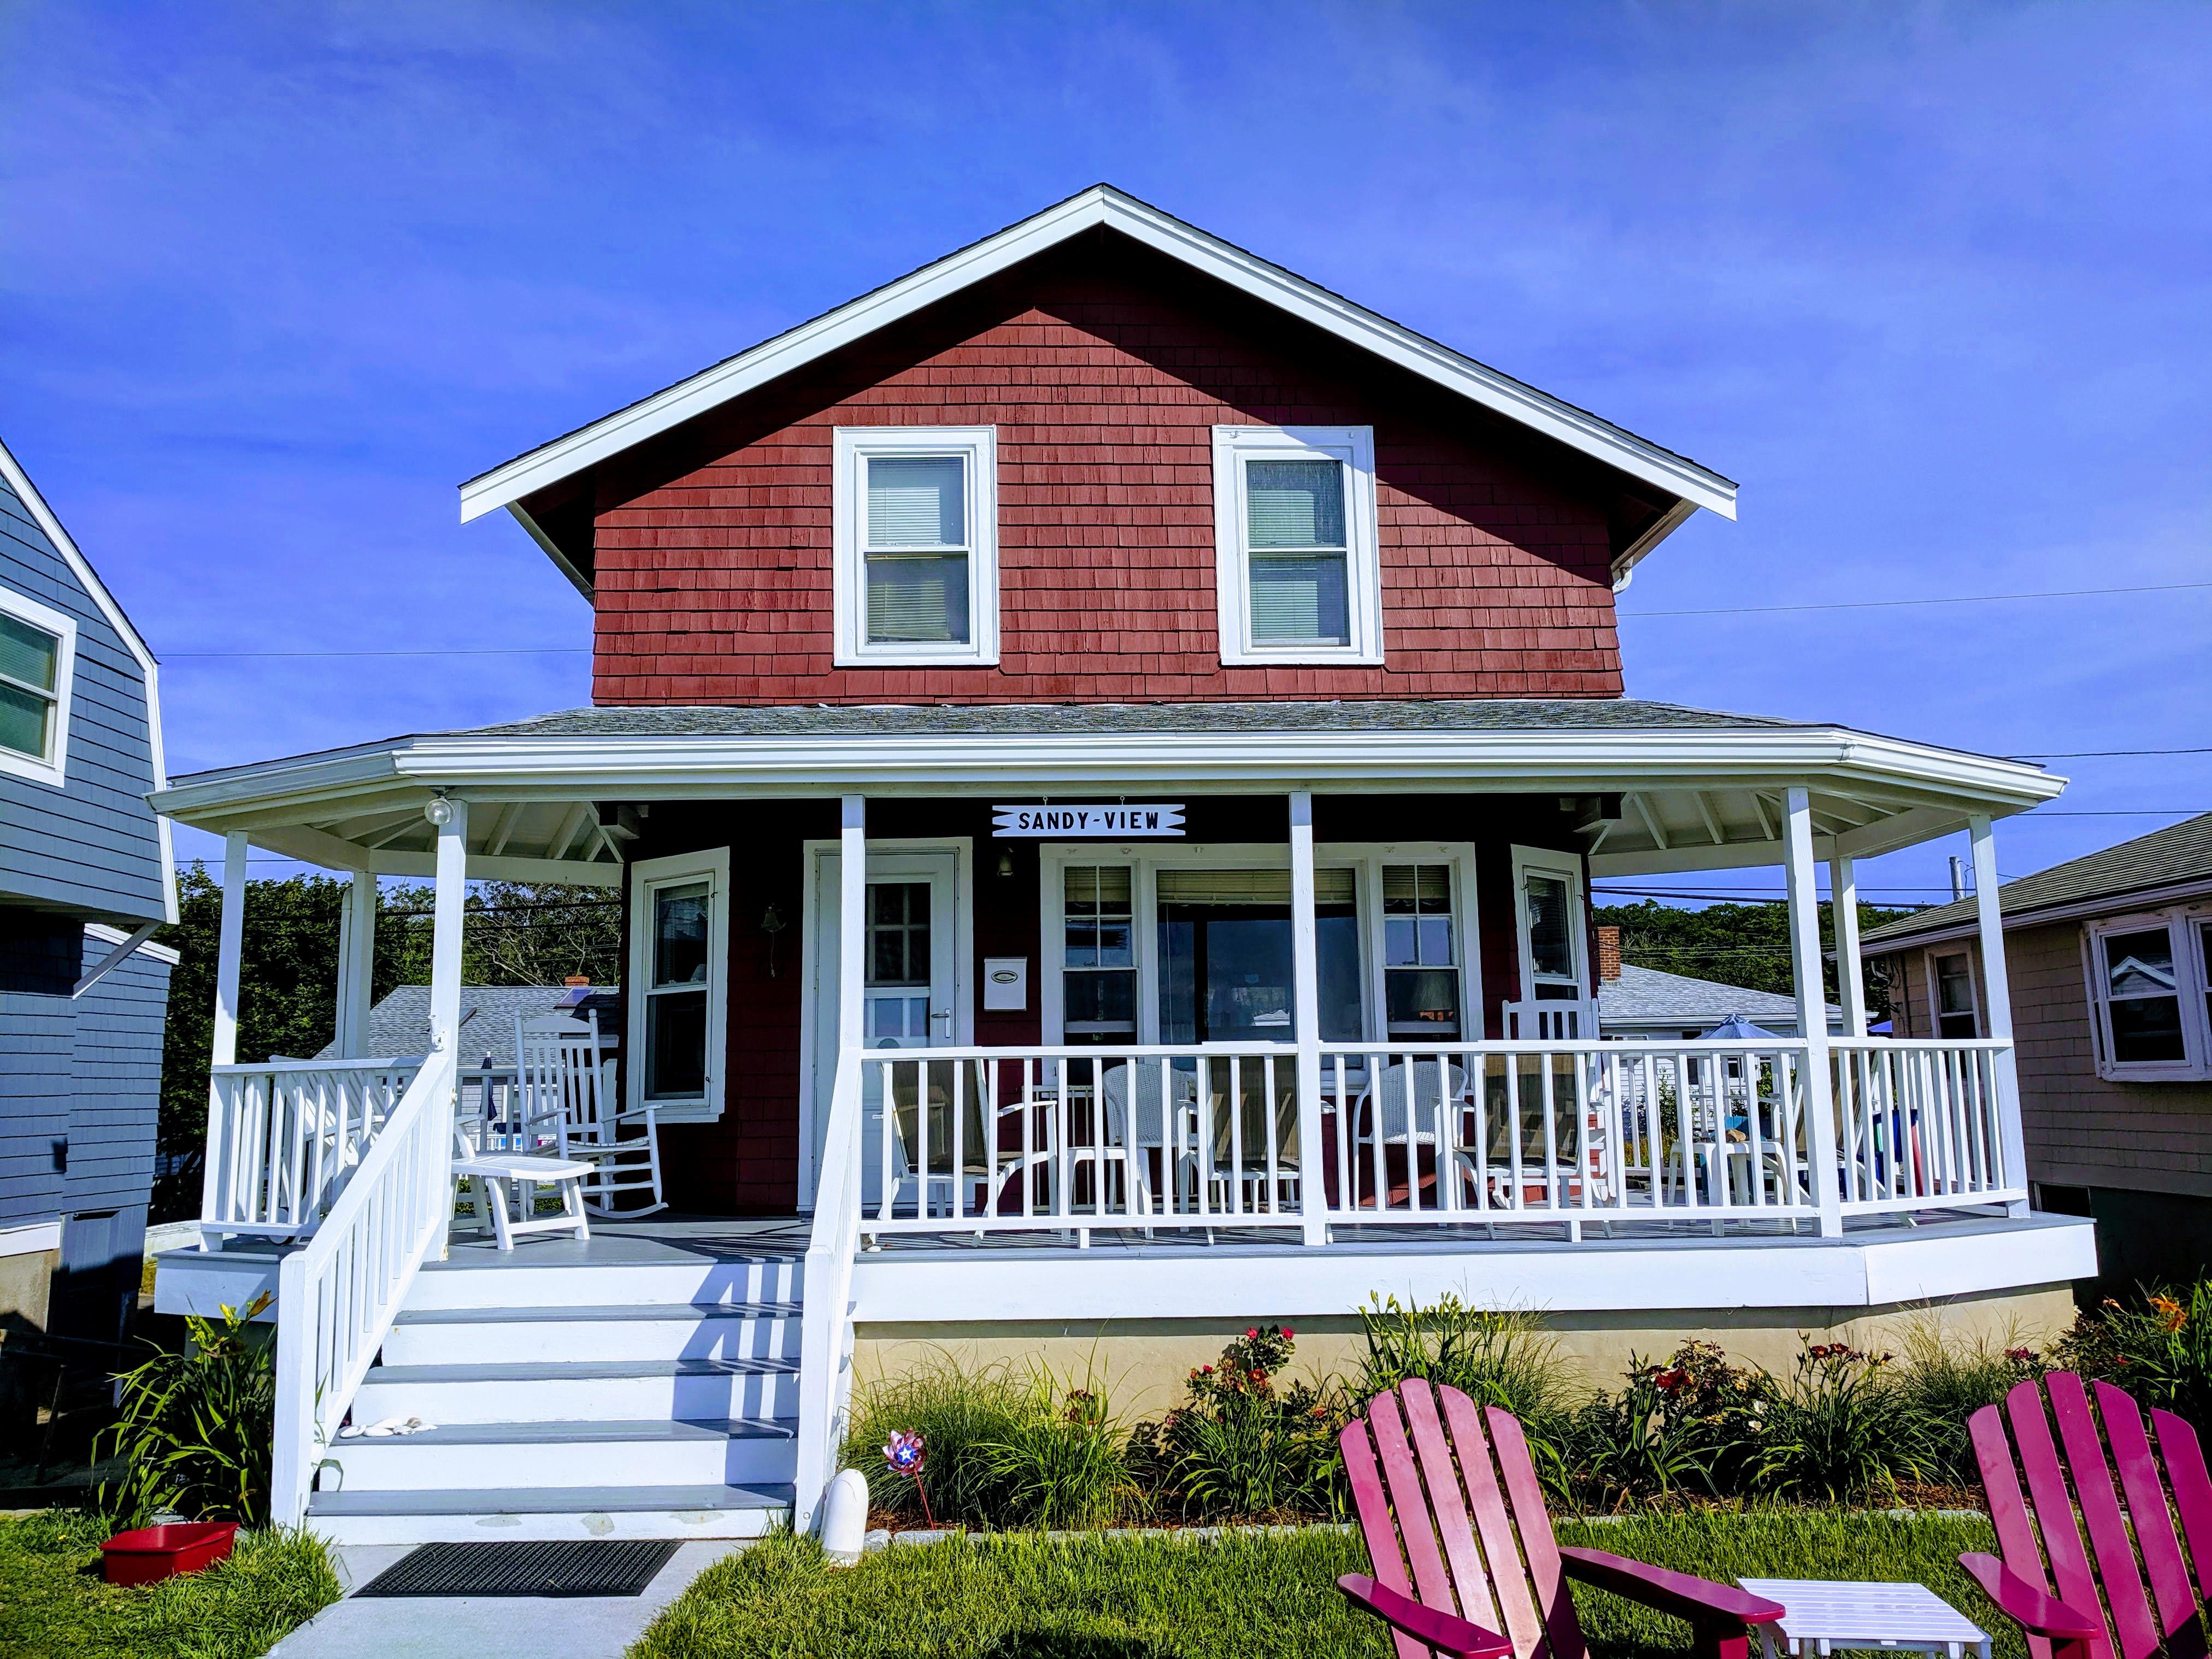 SANDY VIEW front row cottage names _Long Beach Gloucester Rockport Massachusetts_summer 2019 © c ryan